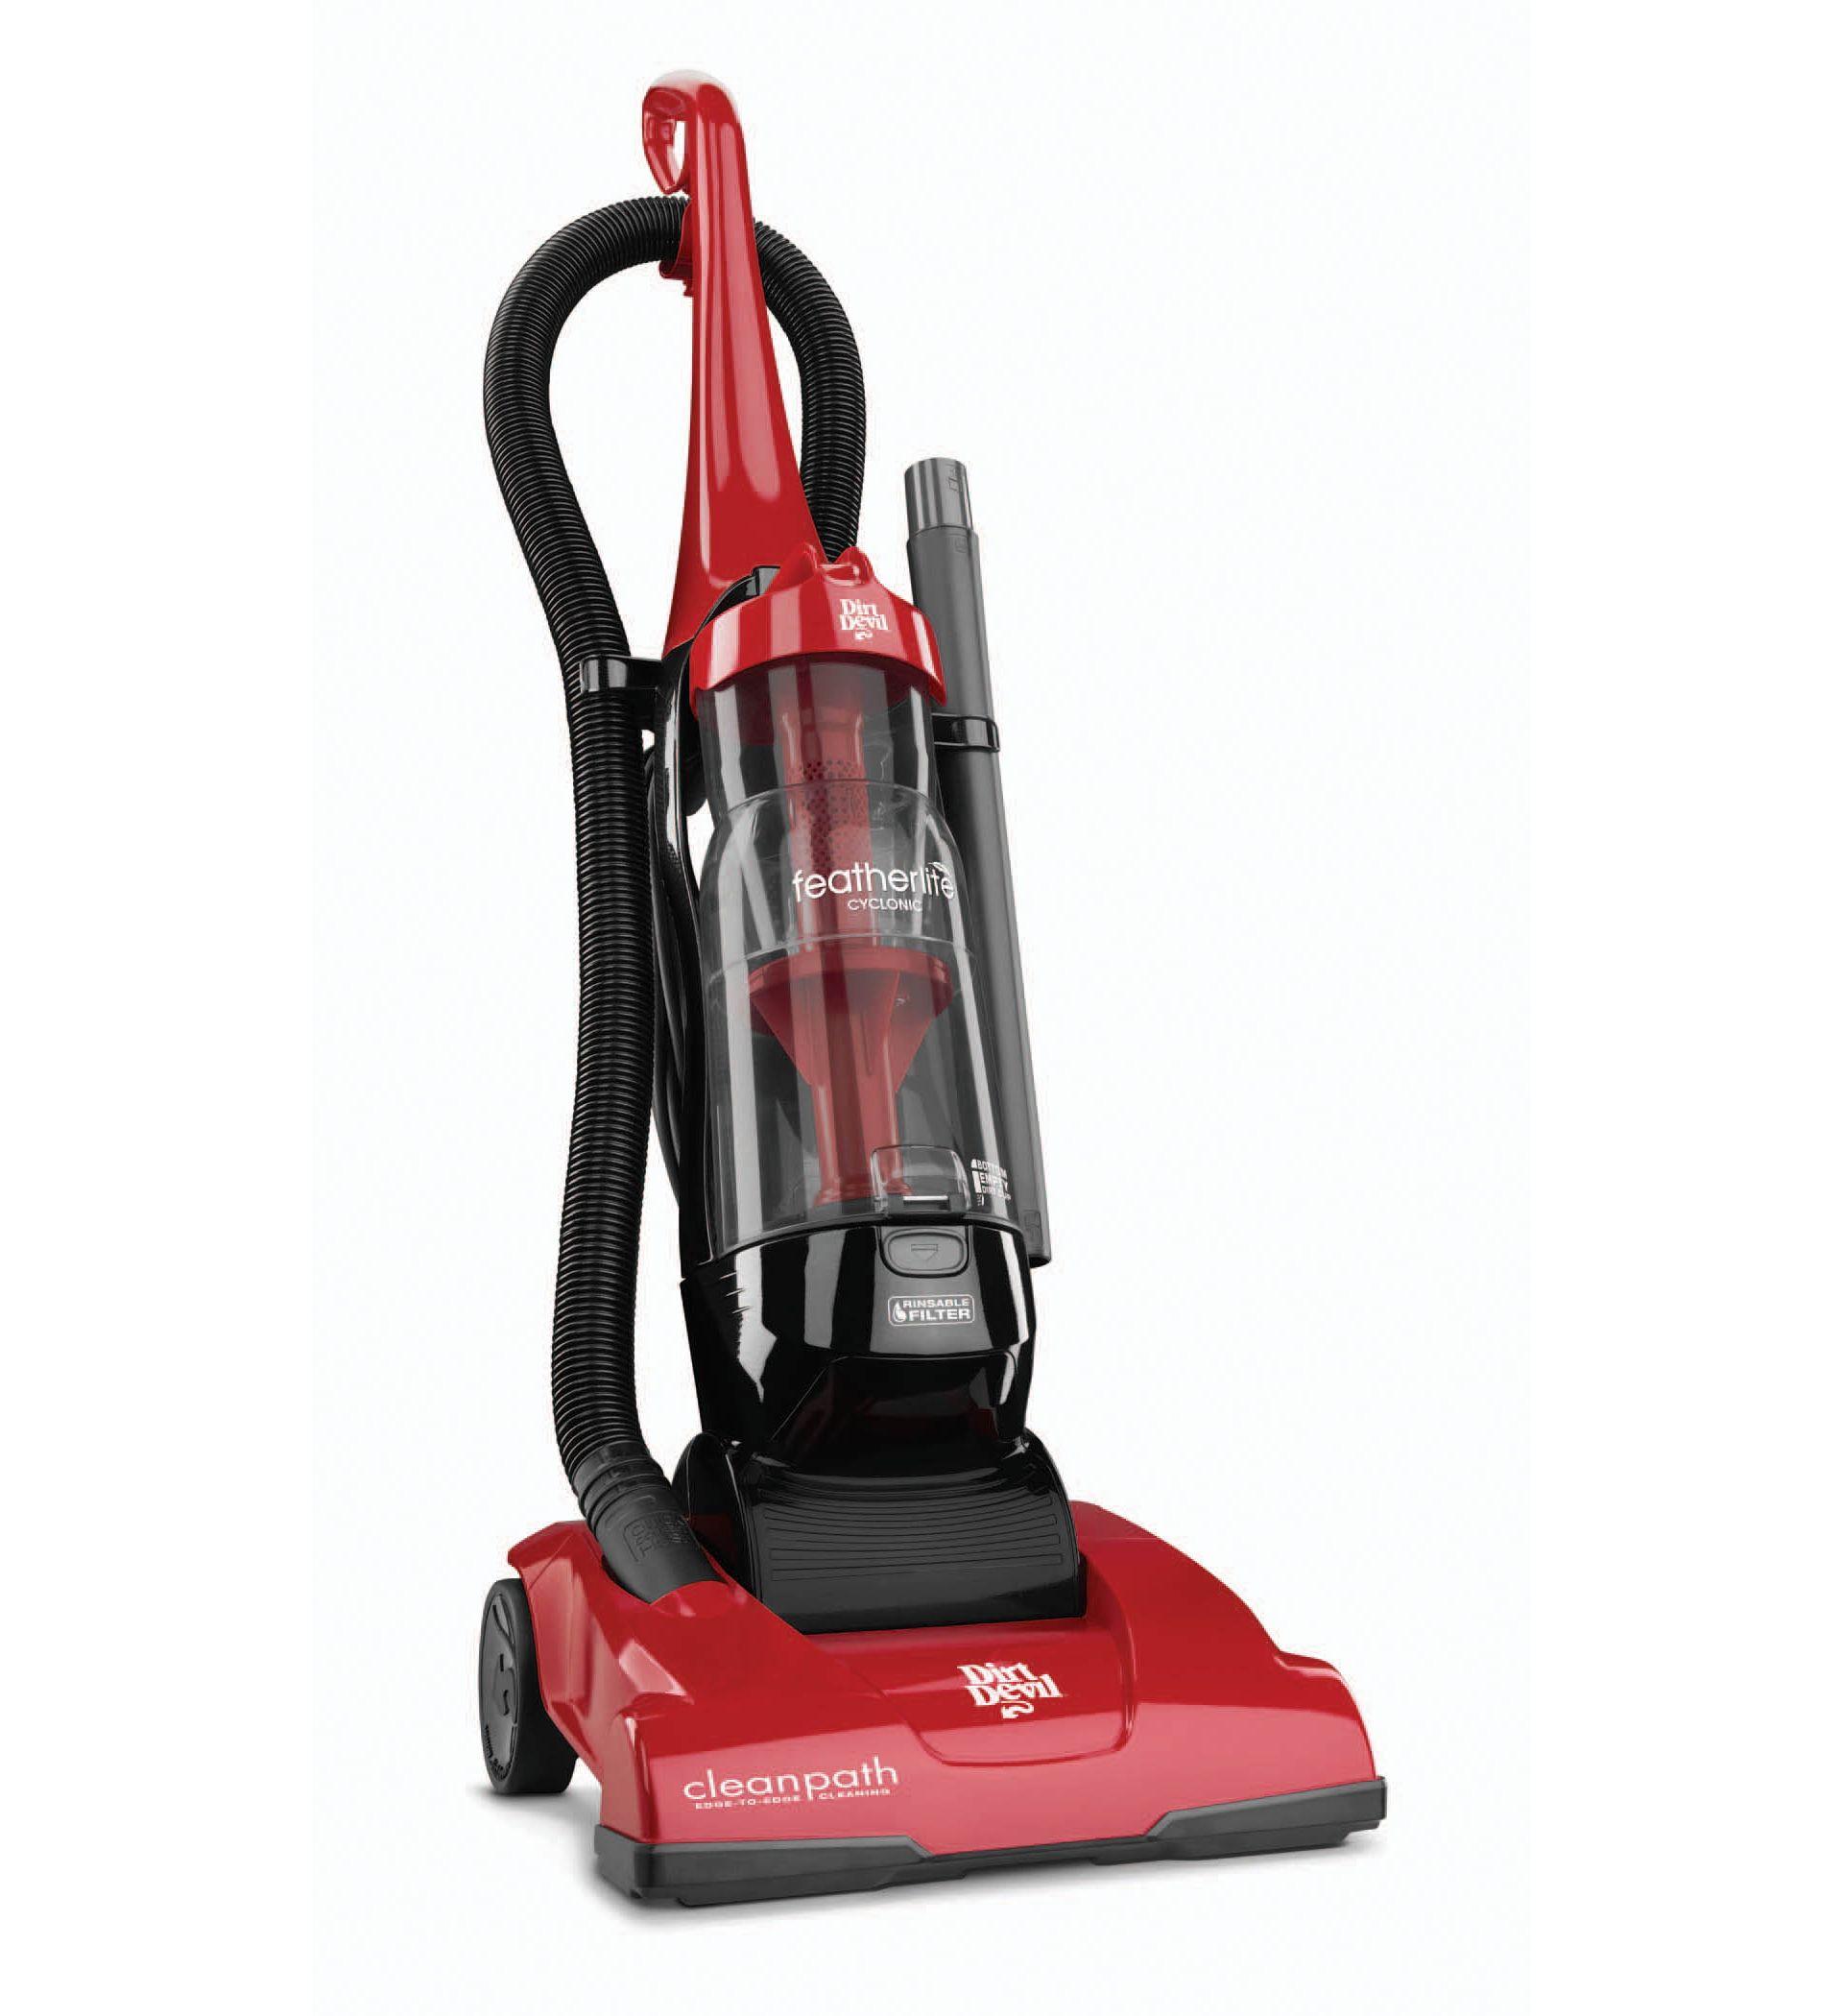 Dirt Devil Featherlite Bagless Vacuum Cleaner Review